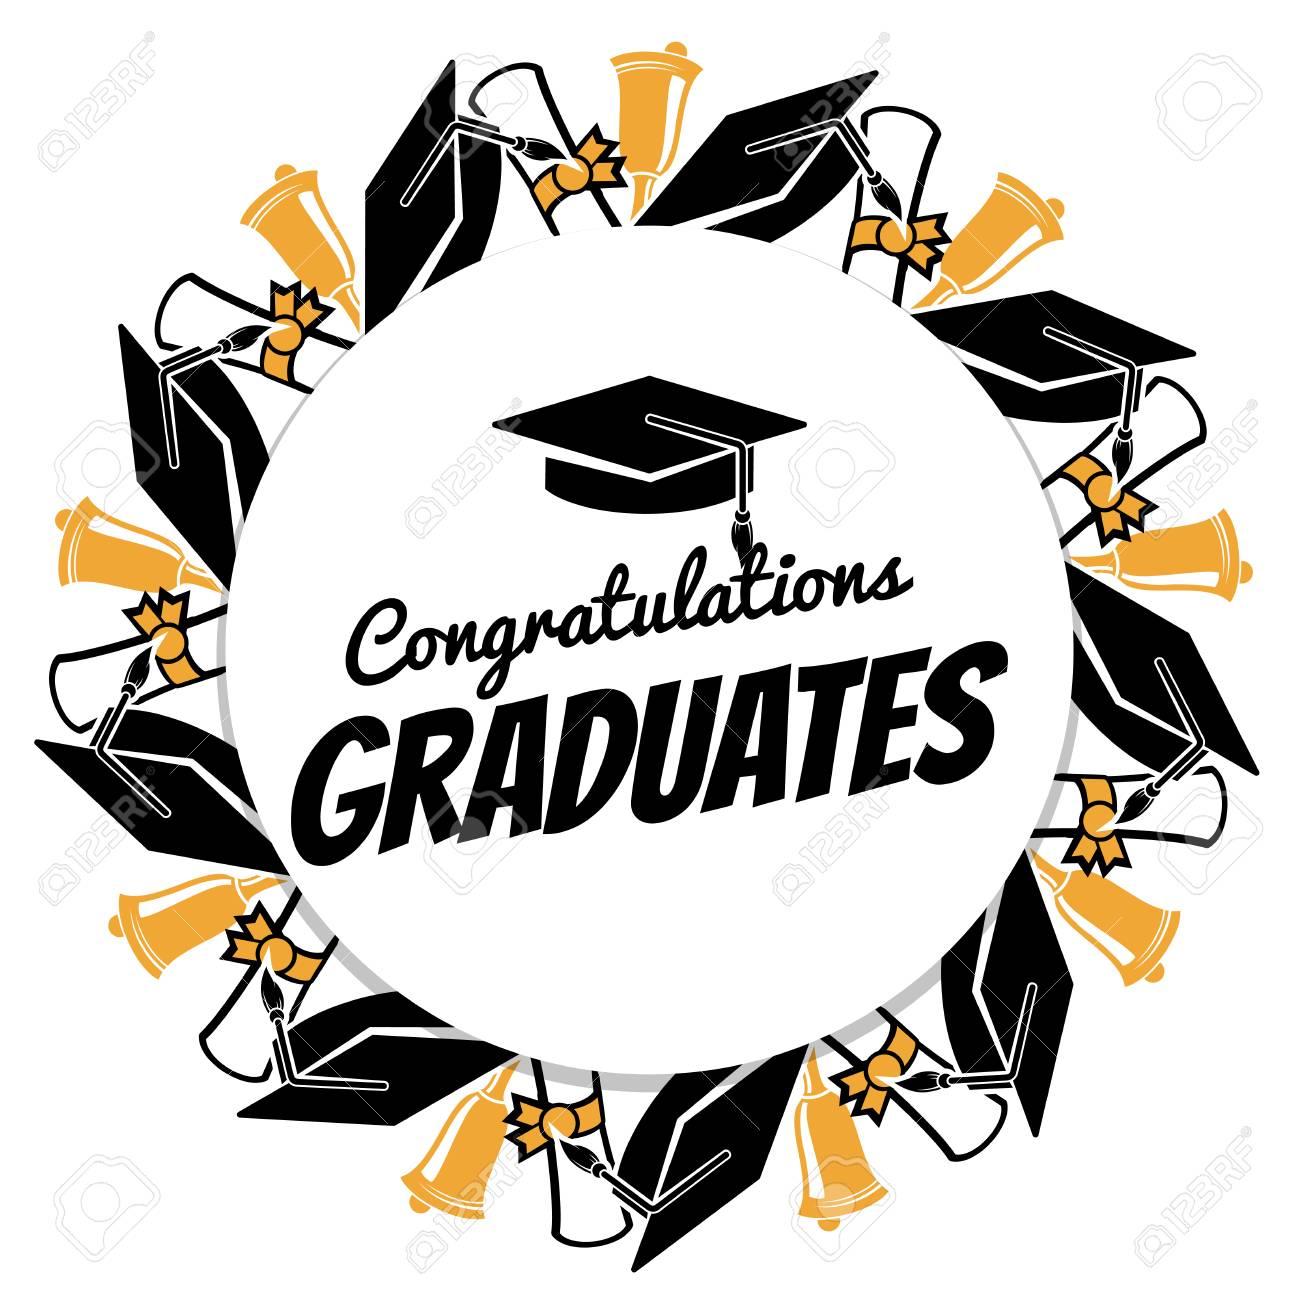 Congrats Graduates Round Banner With Students Accessorises Graduation Celebration Graduate Ceremony